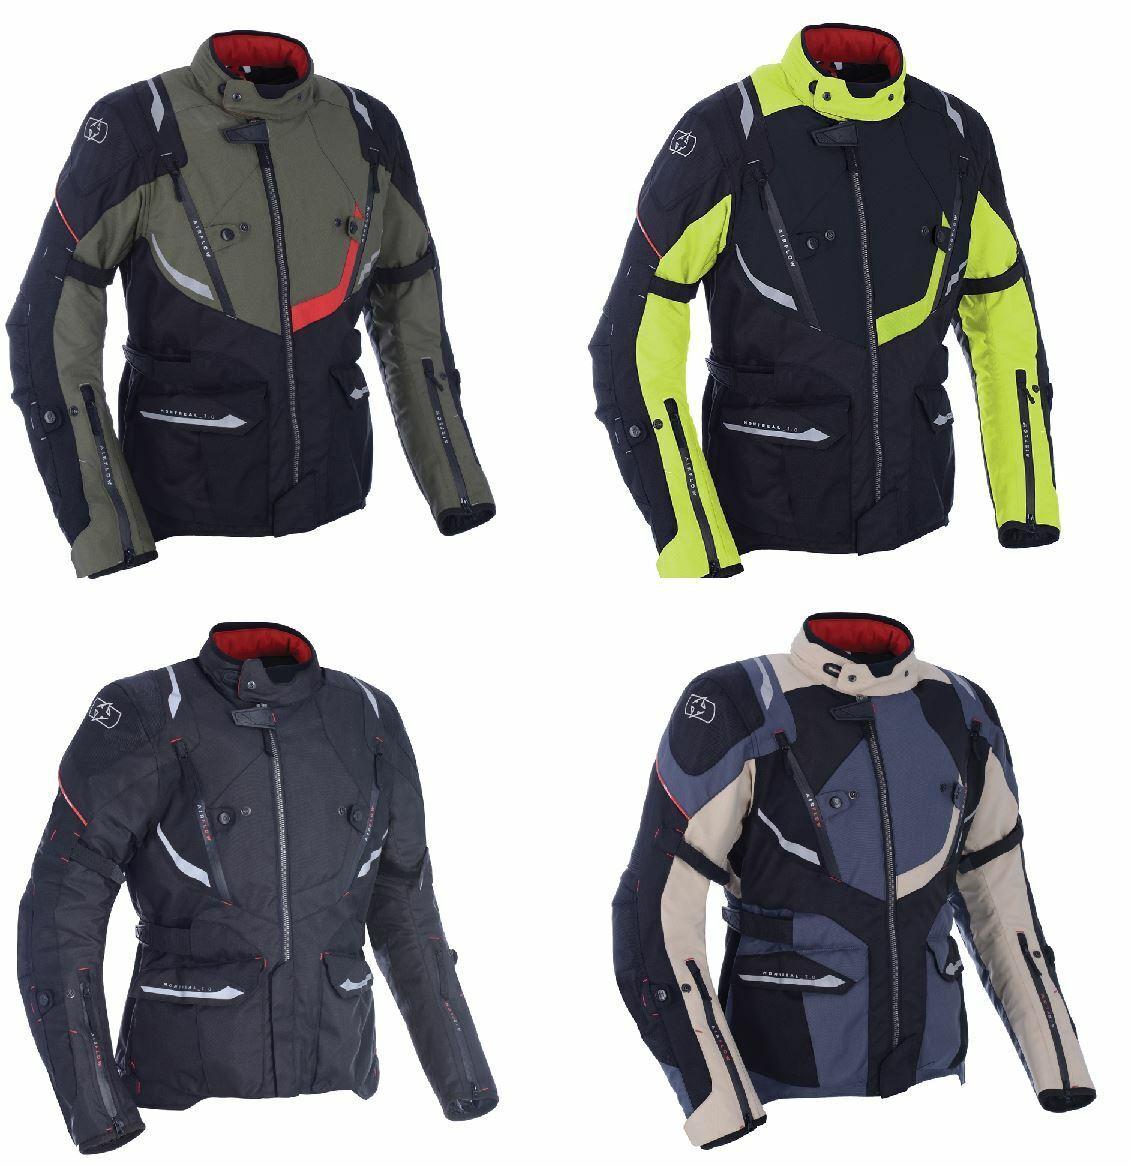 Oxford Montreal 3.0 Motorrad Textiljacke Milit/ärgr/ün 3XL